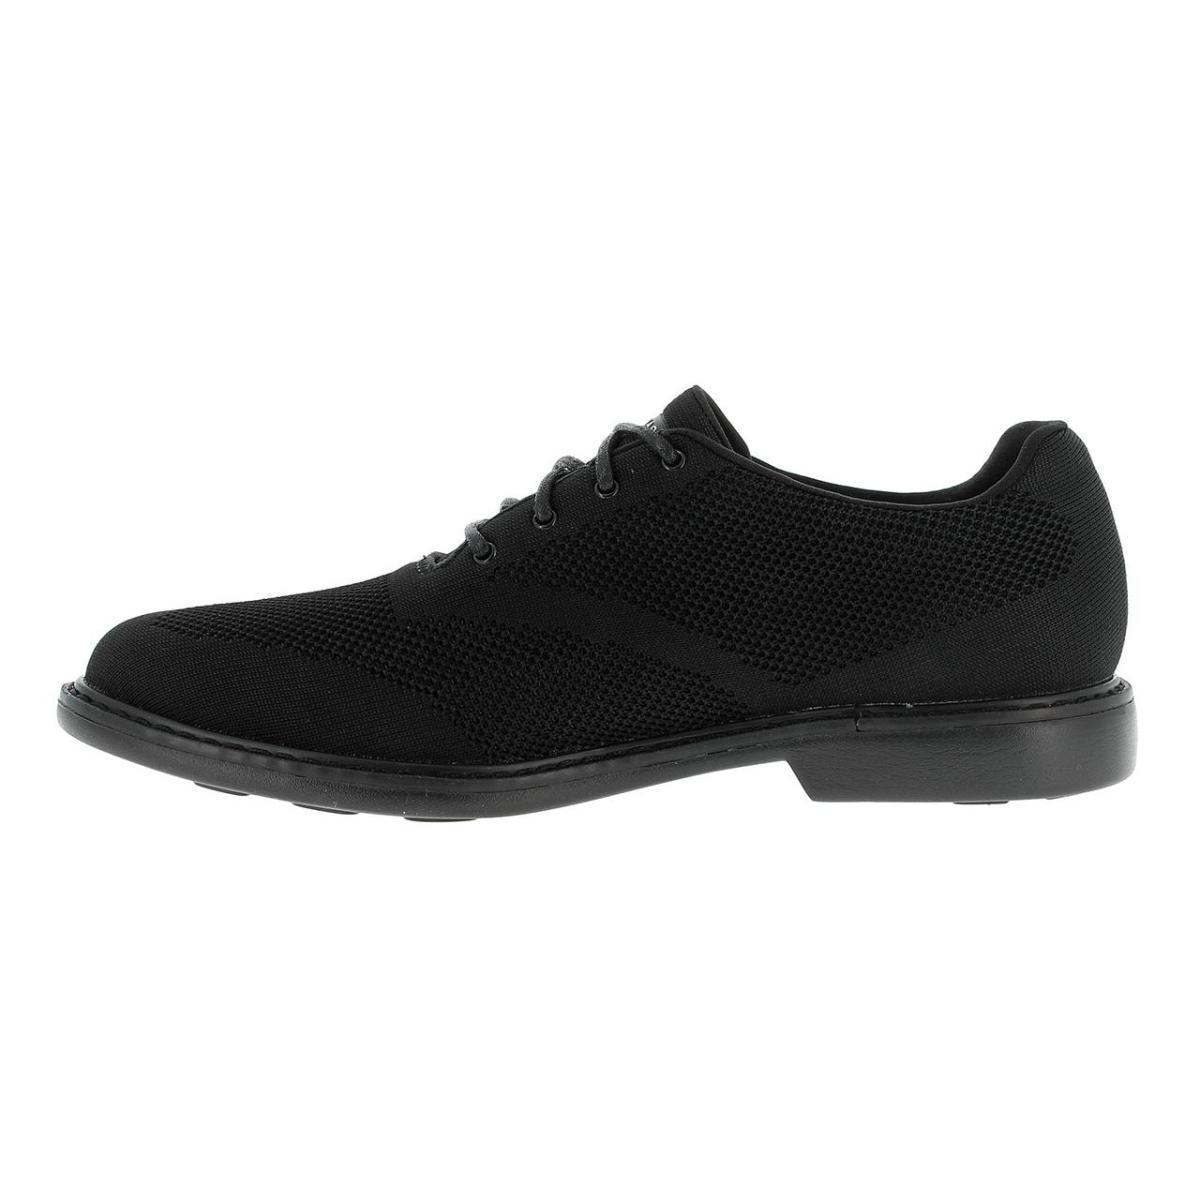 Textil Casual Hombre Skechers Negro Zapatos cBqnUnFW